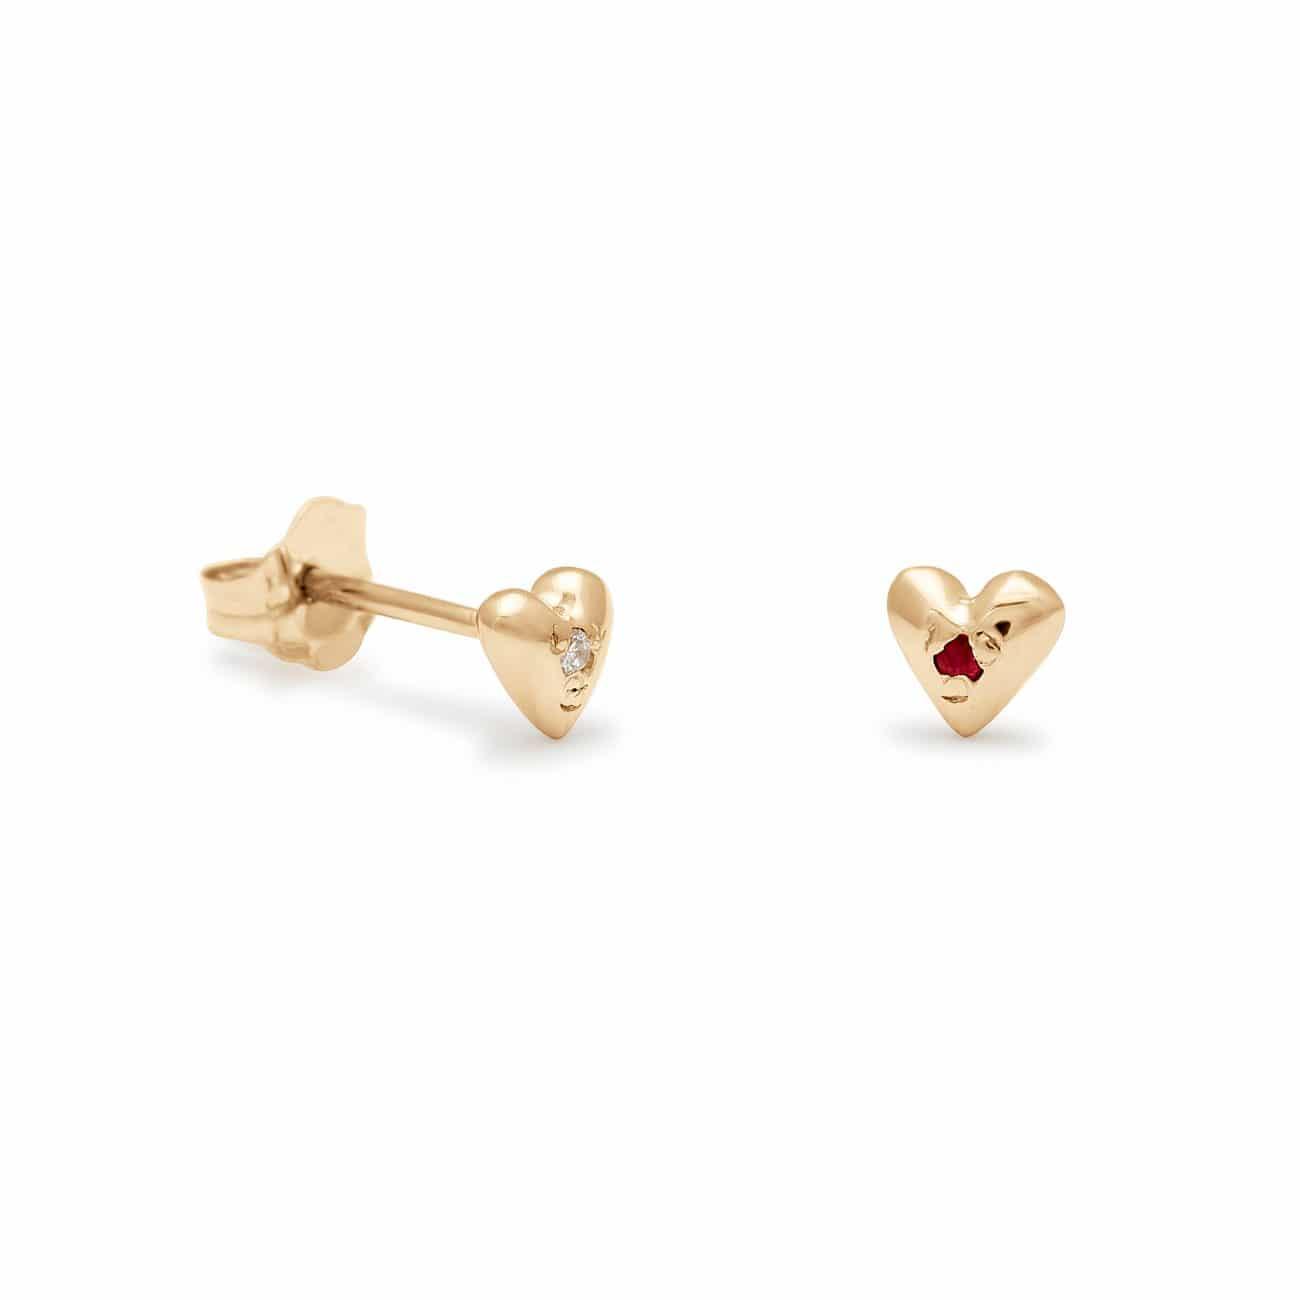 Teeny Tiny Heart Stud Earrings in Yellow Gold